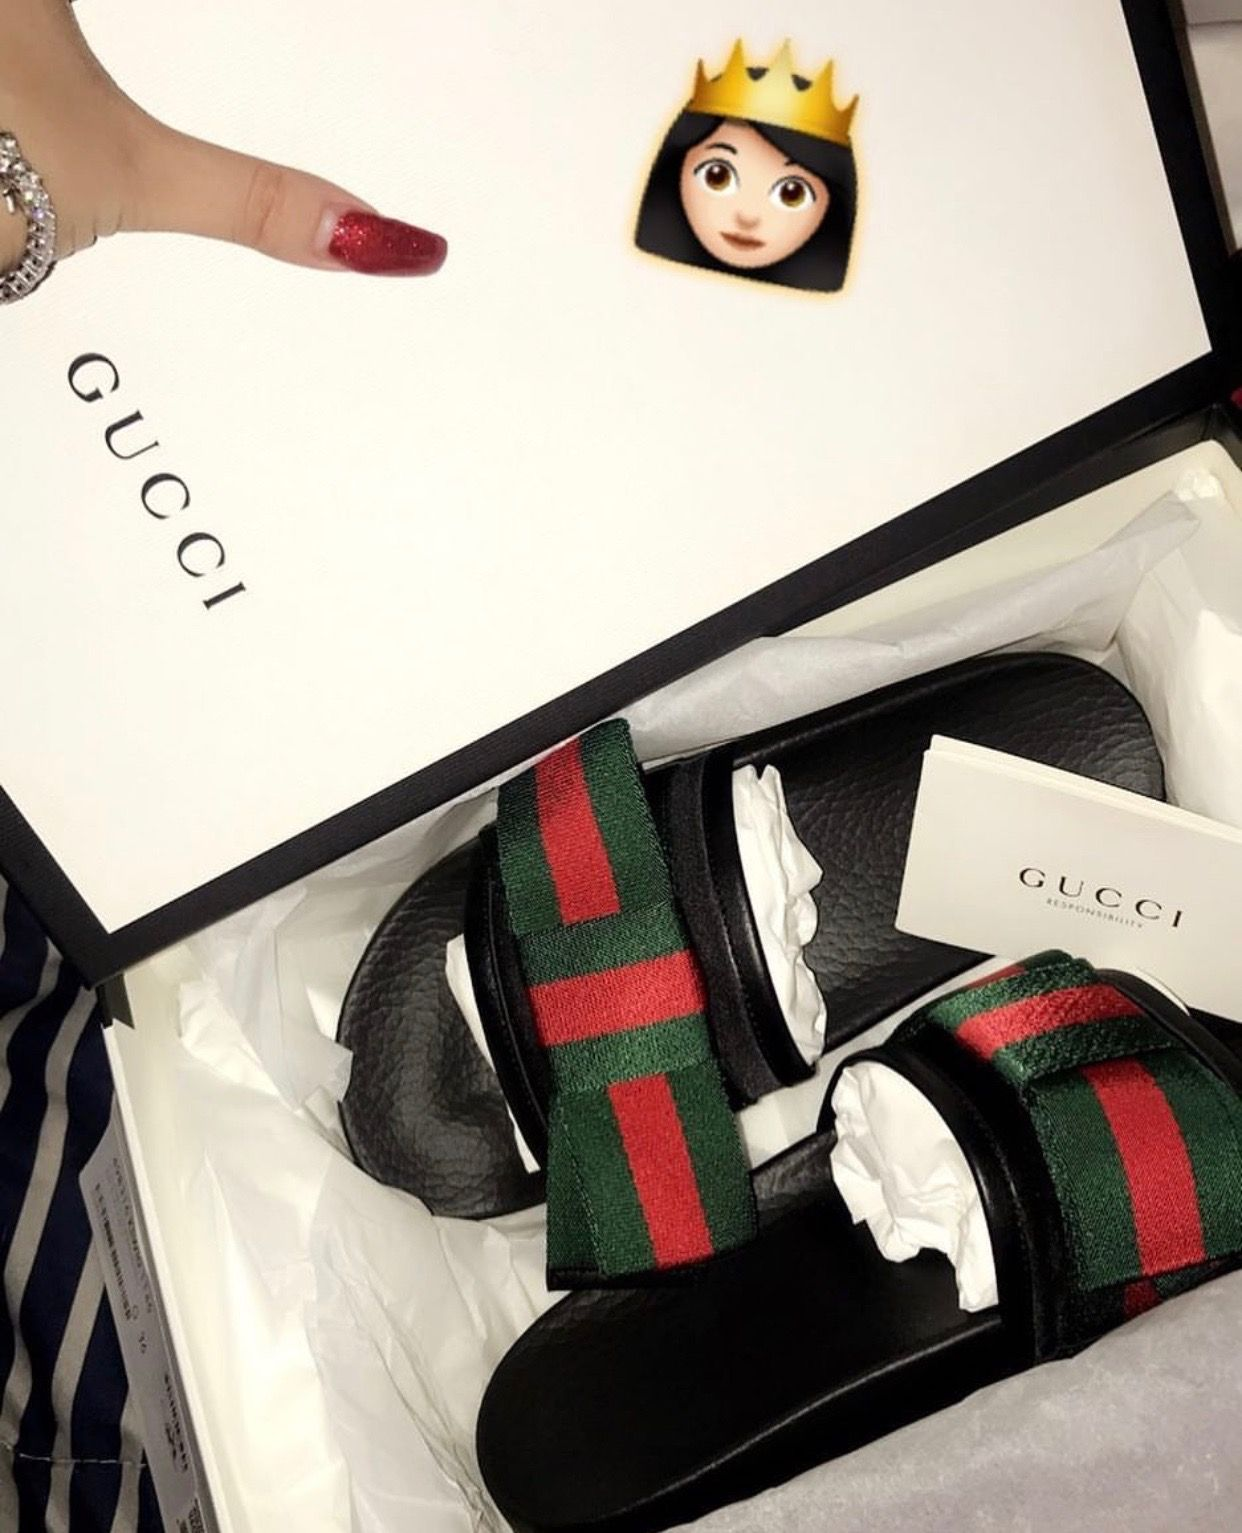 Pelmel España Fanático  Follow: @Tropic_M for more ❄️ | Zapatos gucci, Sandalias bonitas, Sandalias  nike mujer